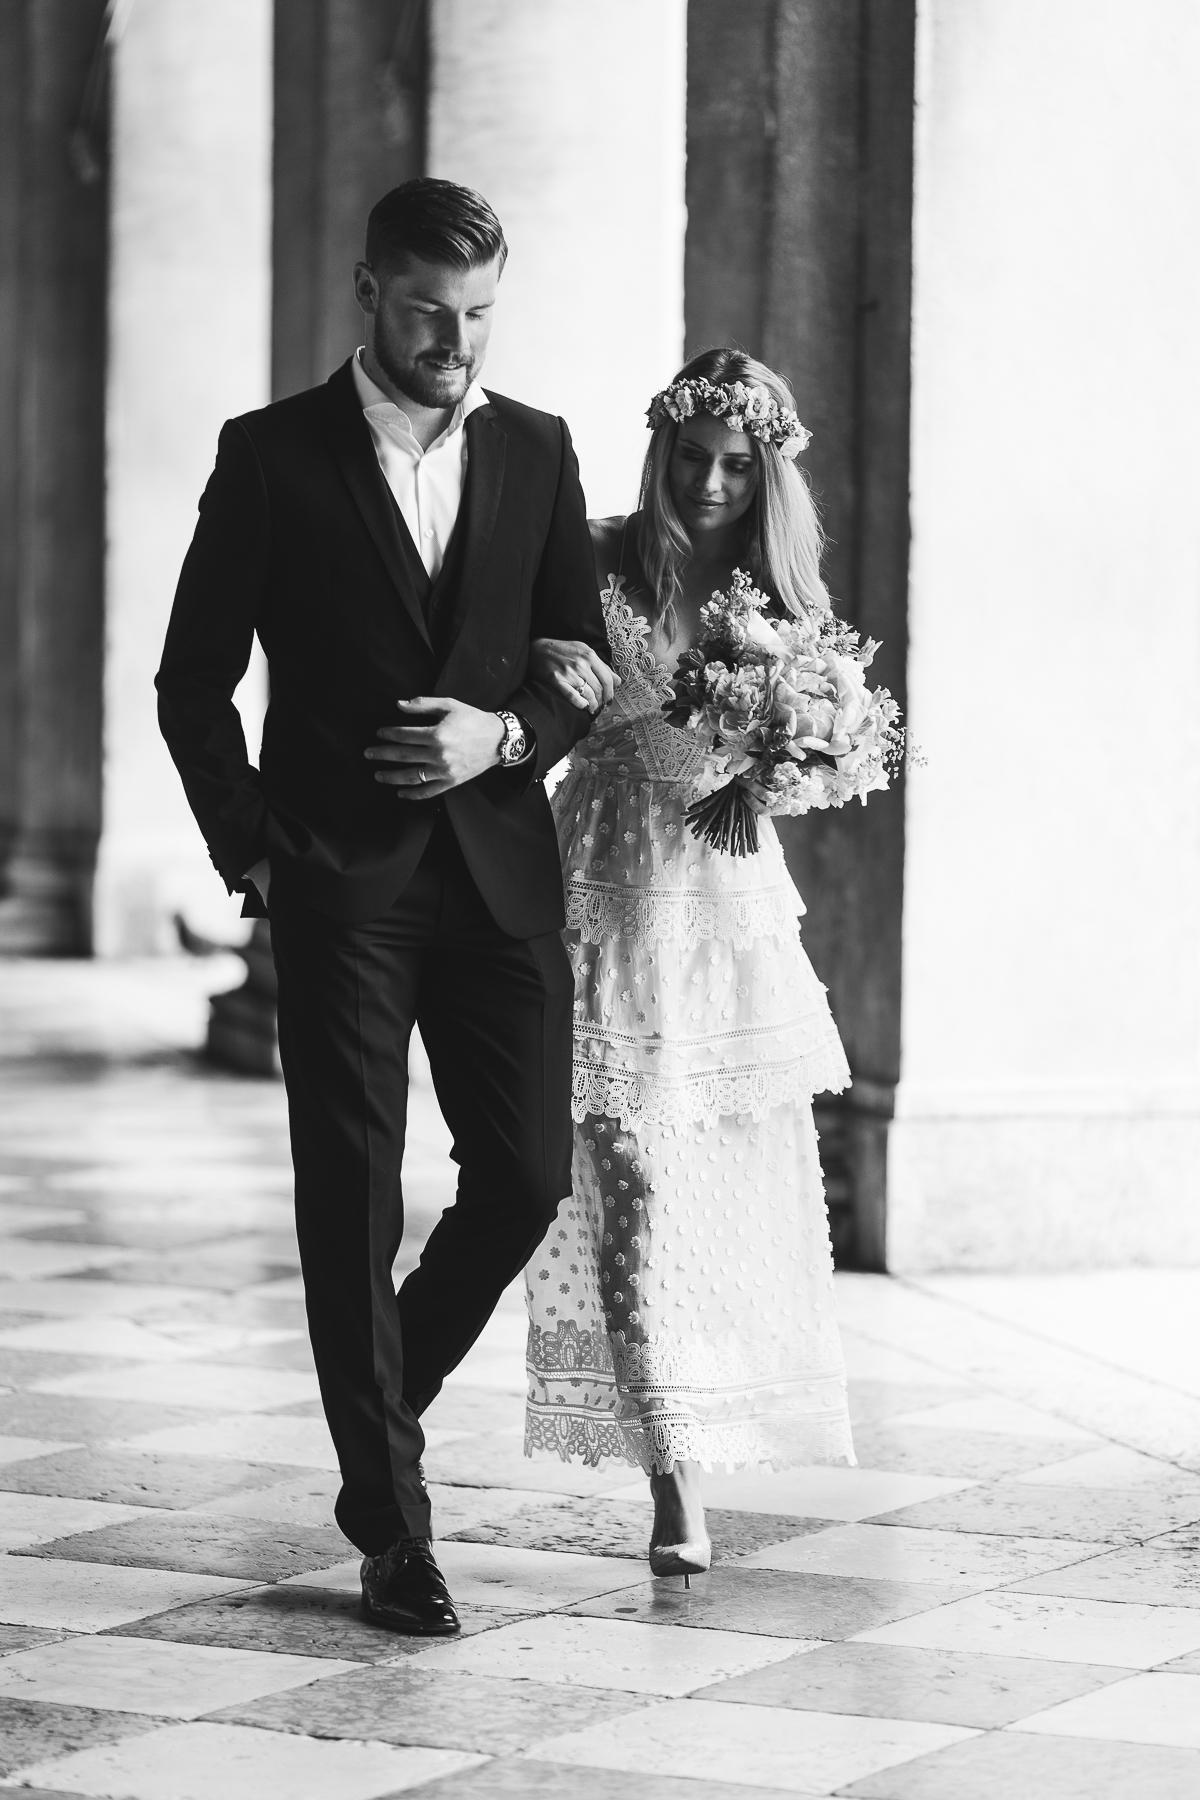 Hochzeitsfotograf Le Hai Linh Boho Chic After Wedding Shooting Venedig Timo Horn 1.FC Koeln 026.jpg